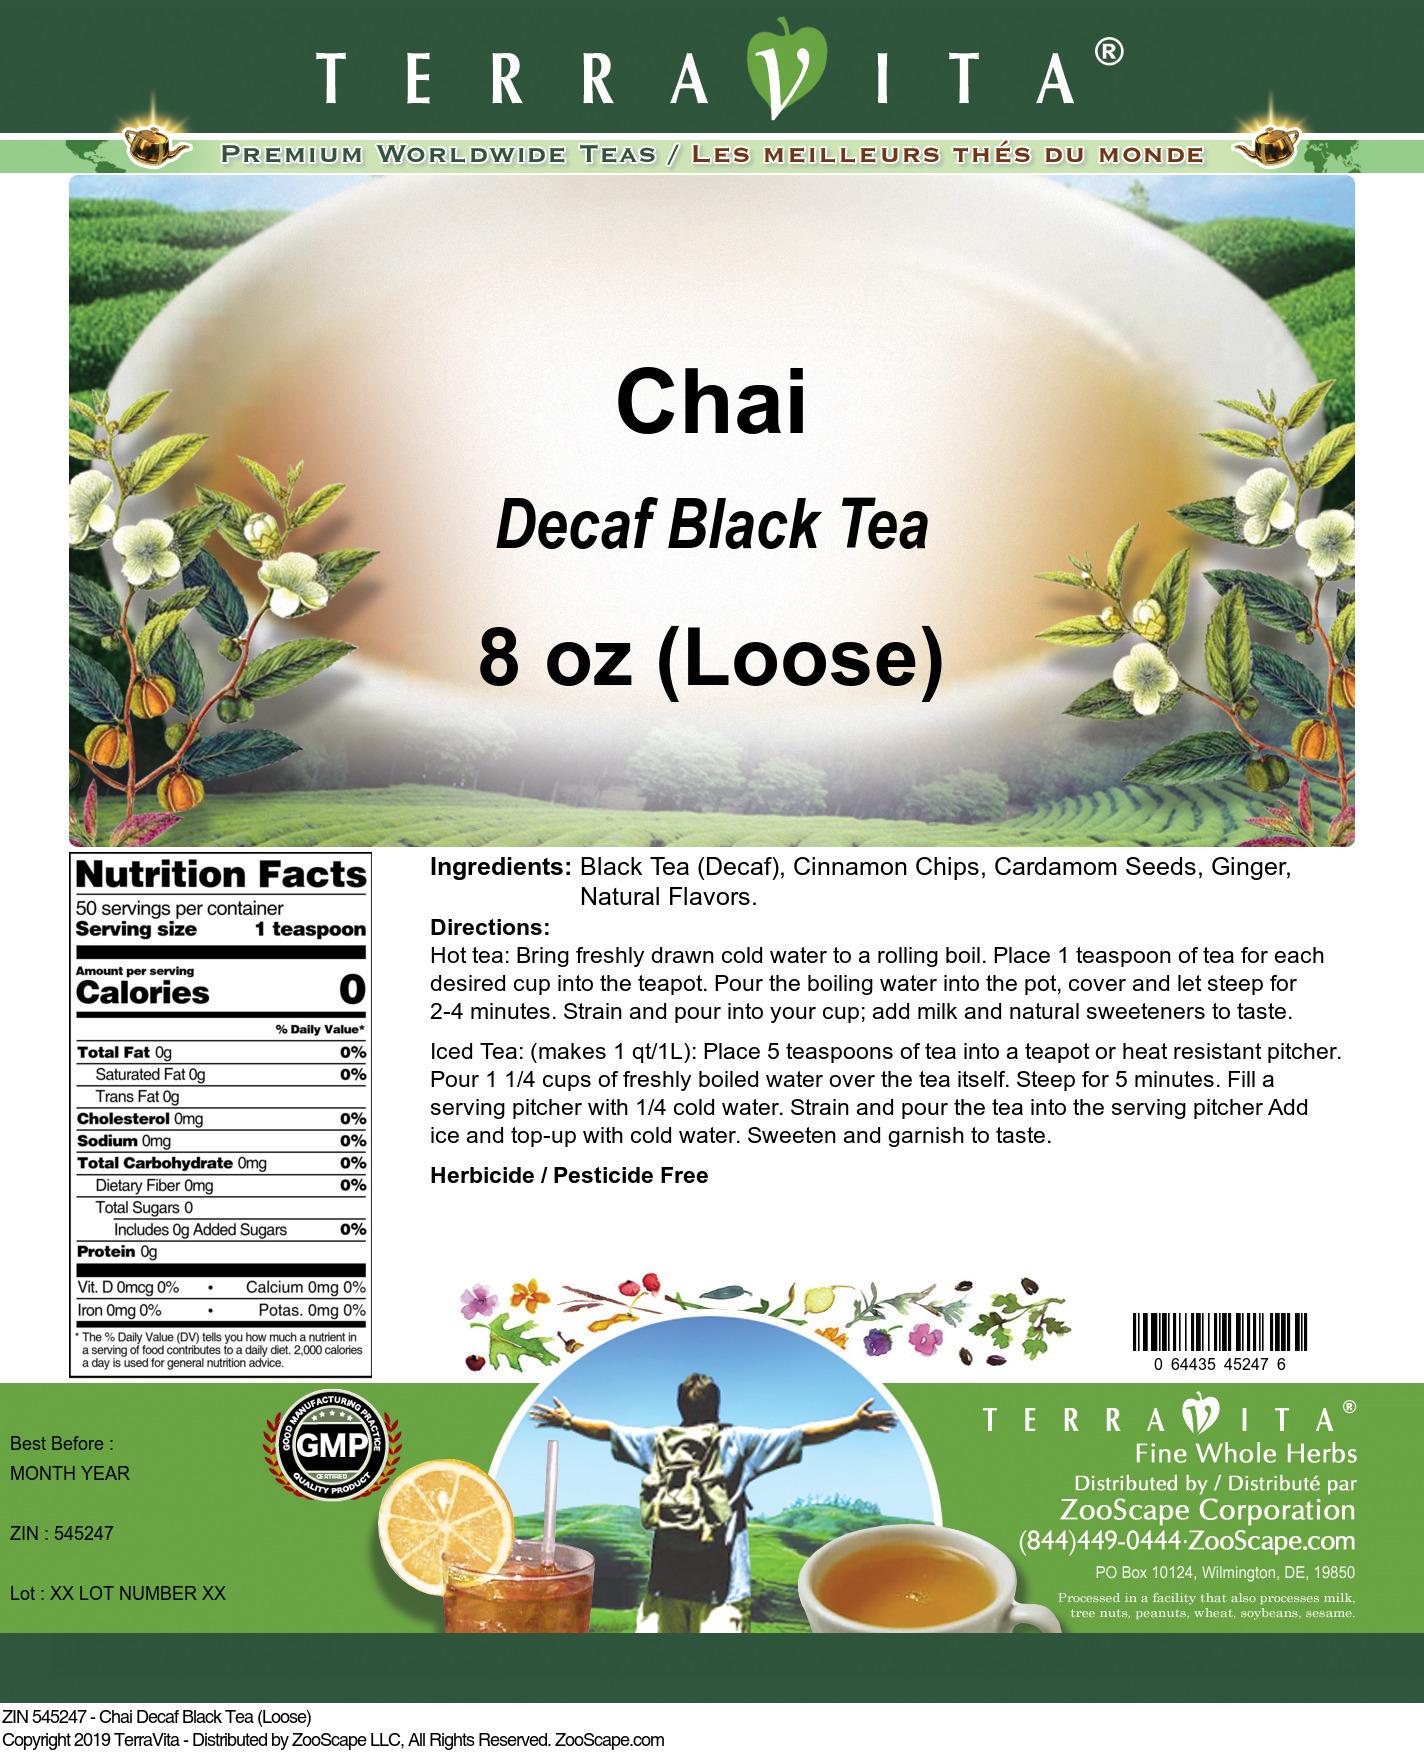 Chai Decaf Black Tea